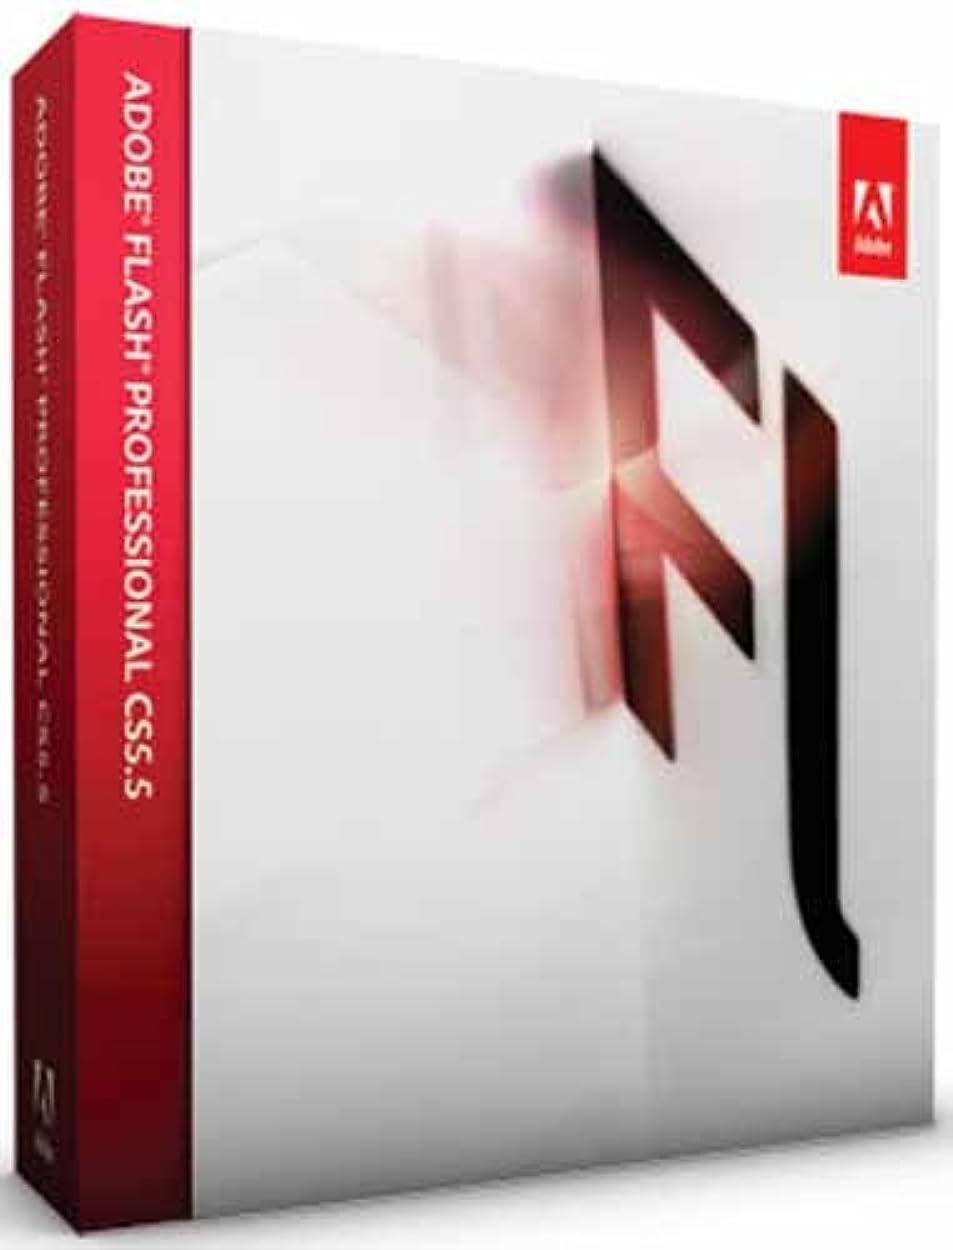 Adobe Flash Professional CS5.5 Windows版 (旧製品)